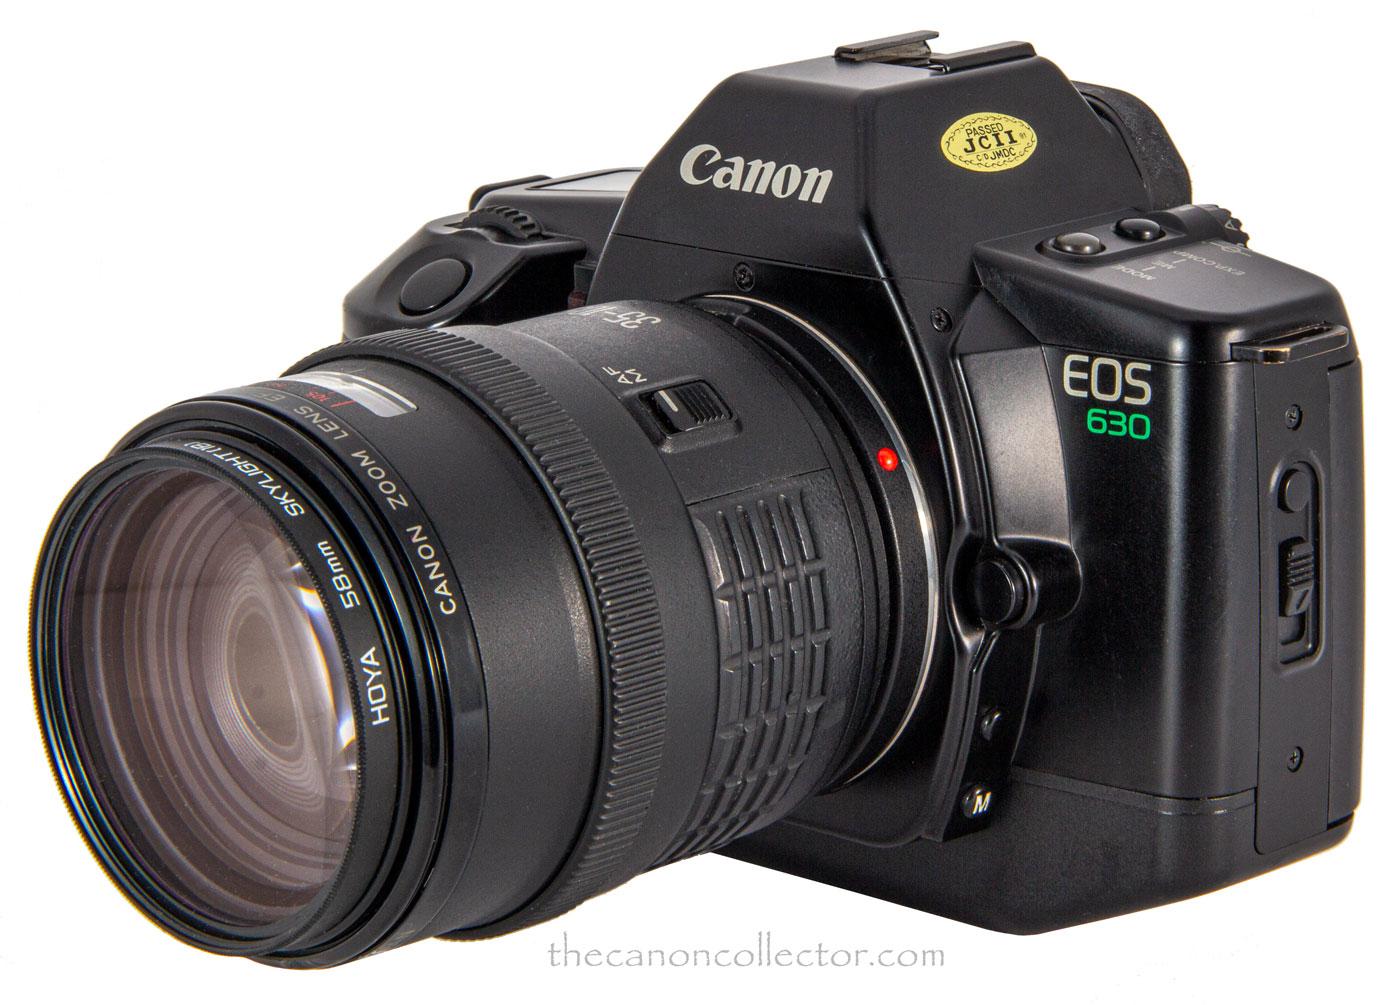 Canon EOS 630 Camera